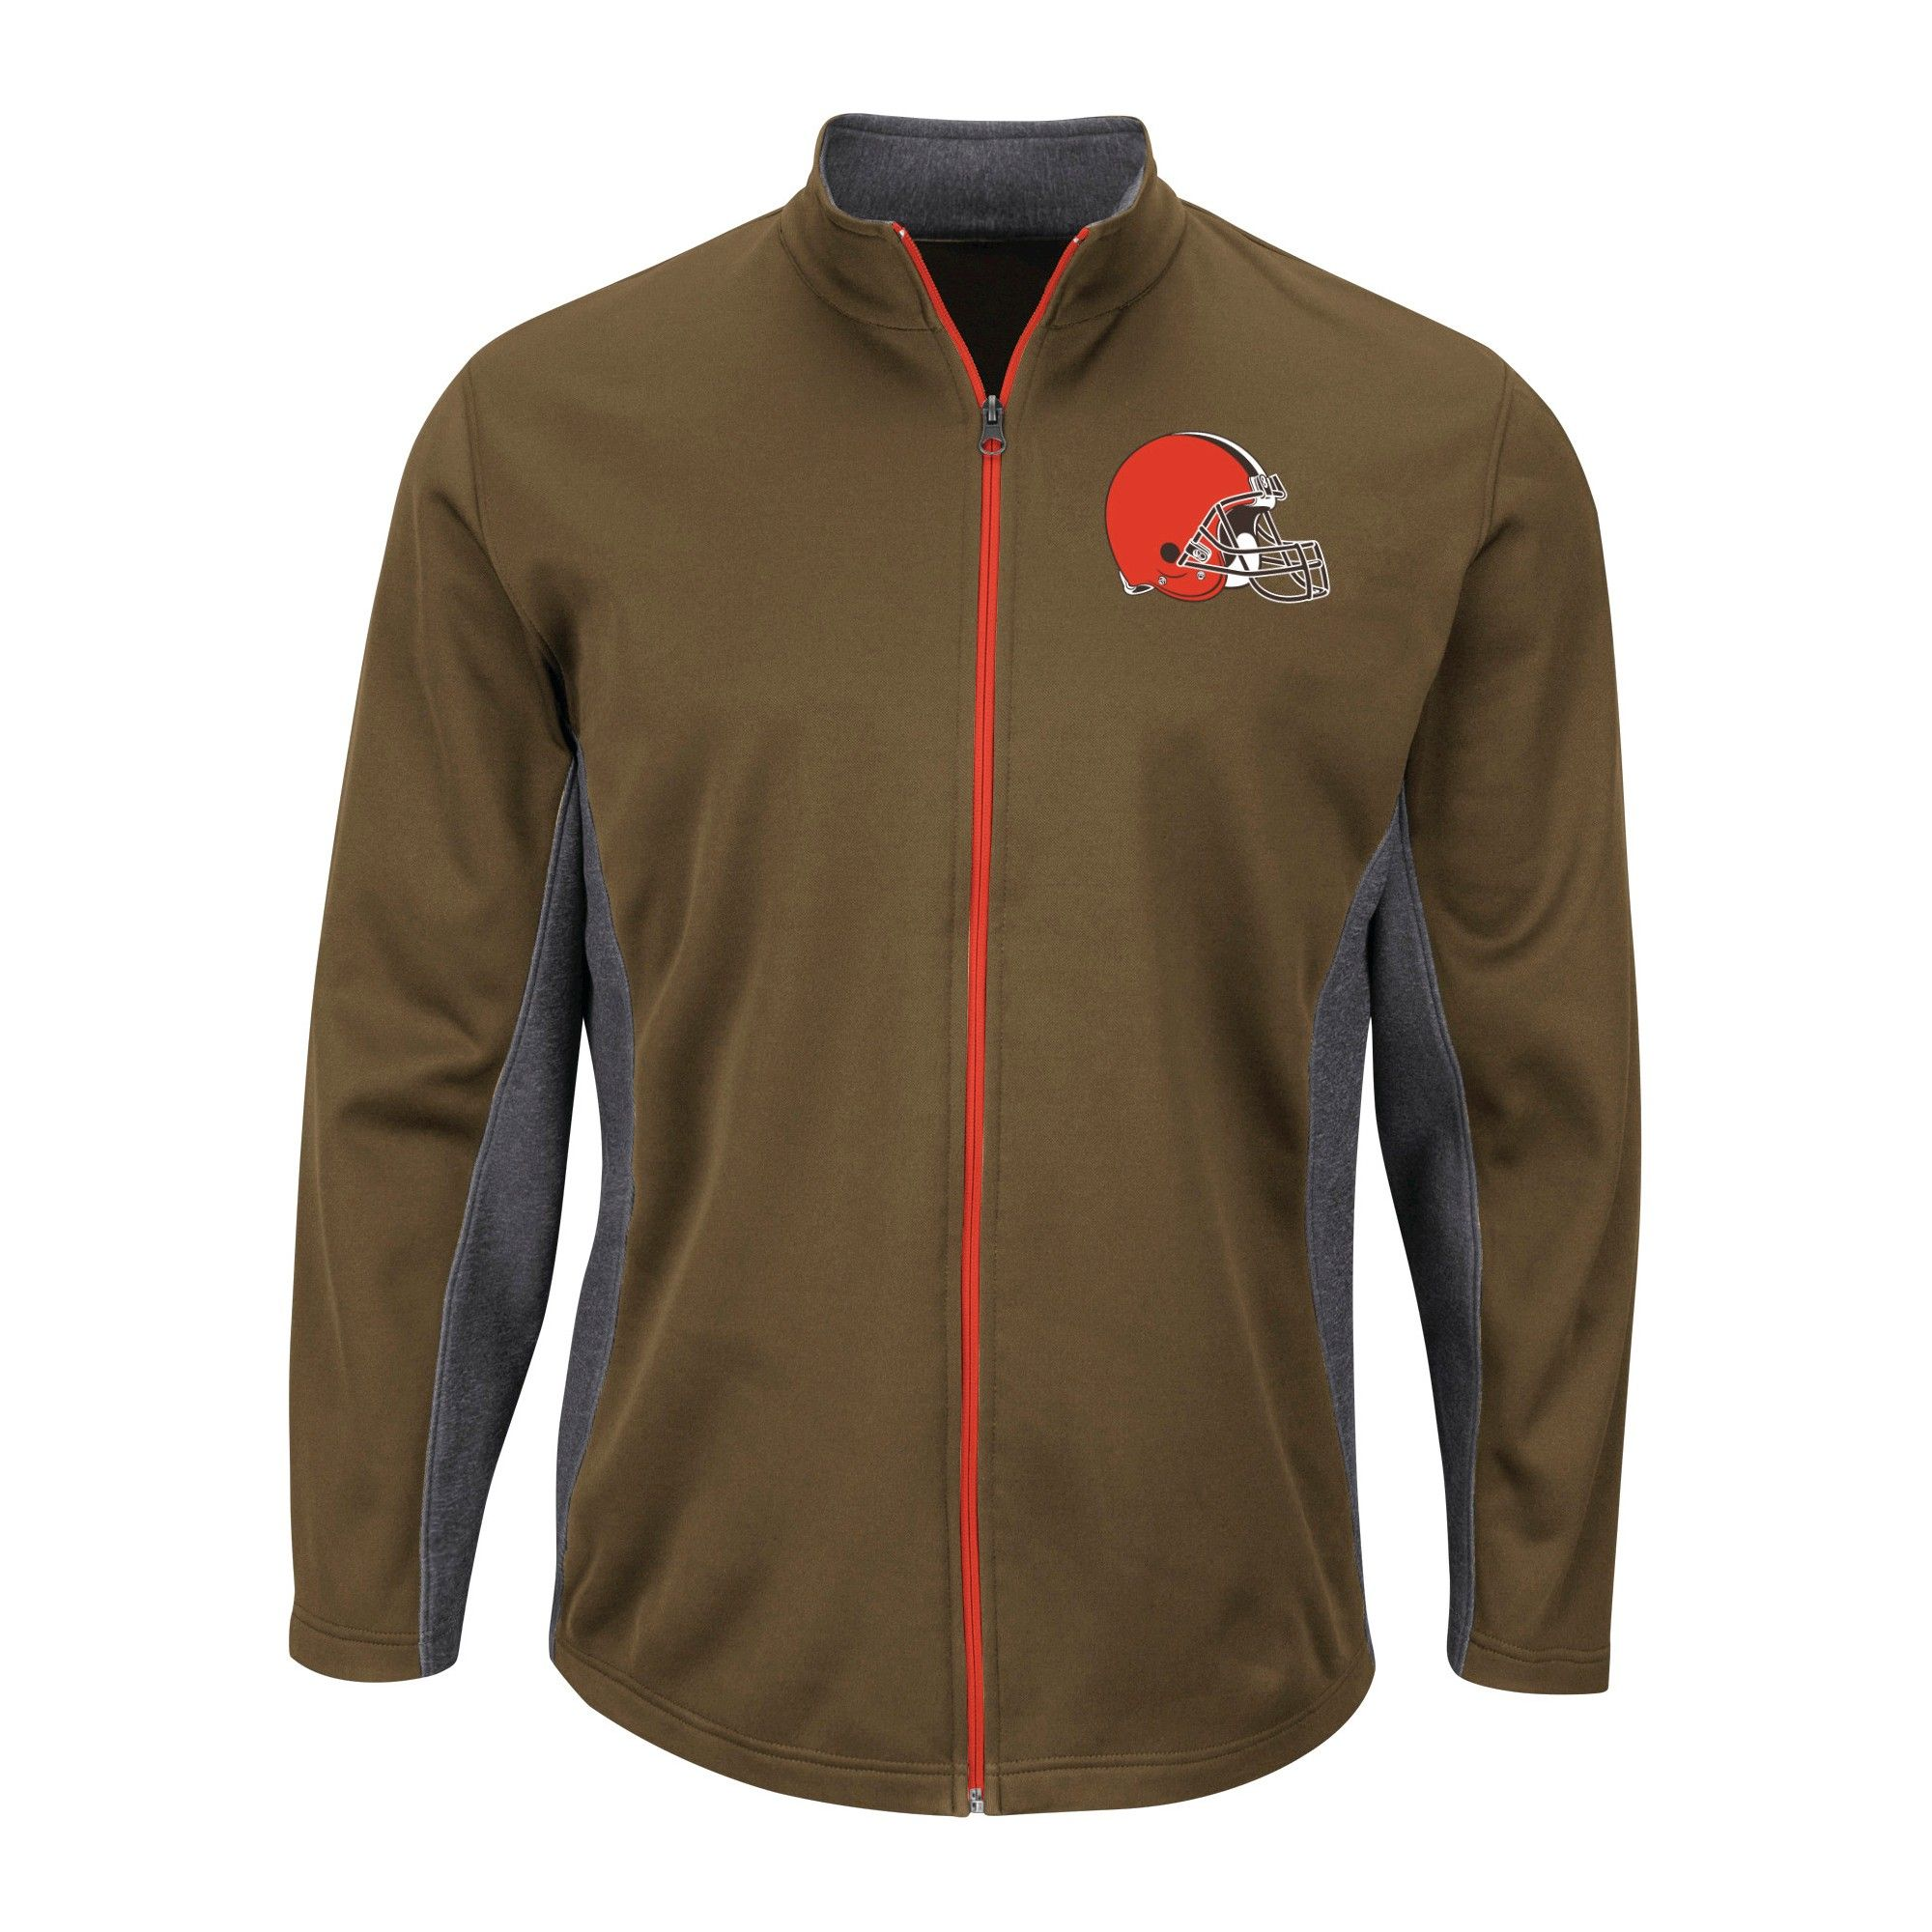 7fac60eaaccc Cleveland Browns Men s Activewear Sweatshirt XL